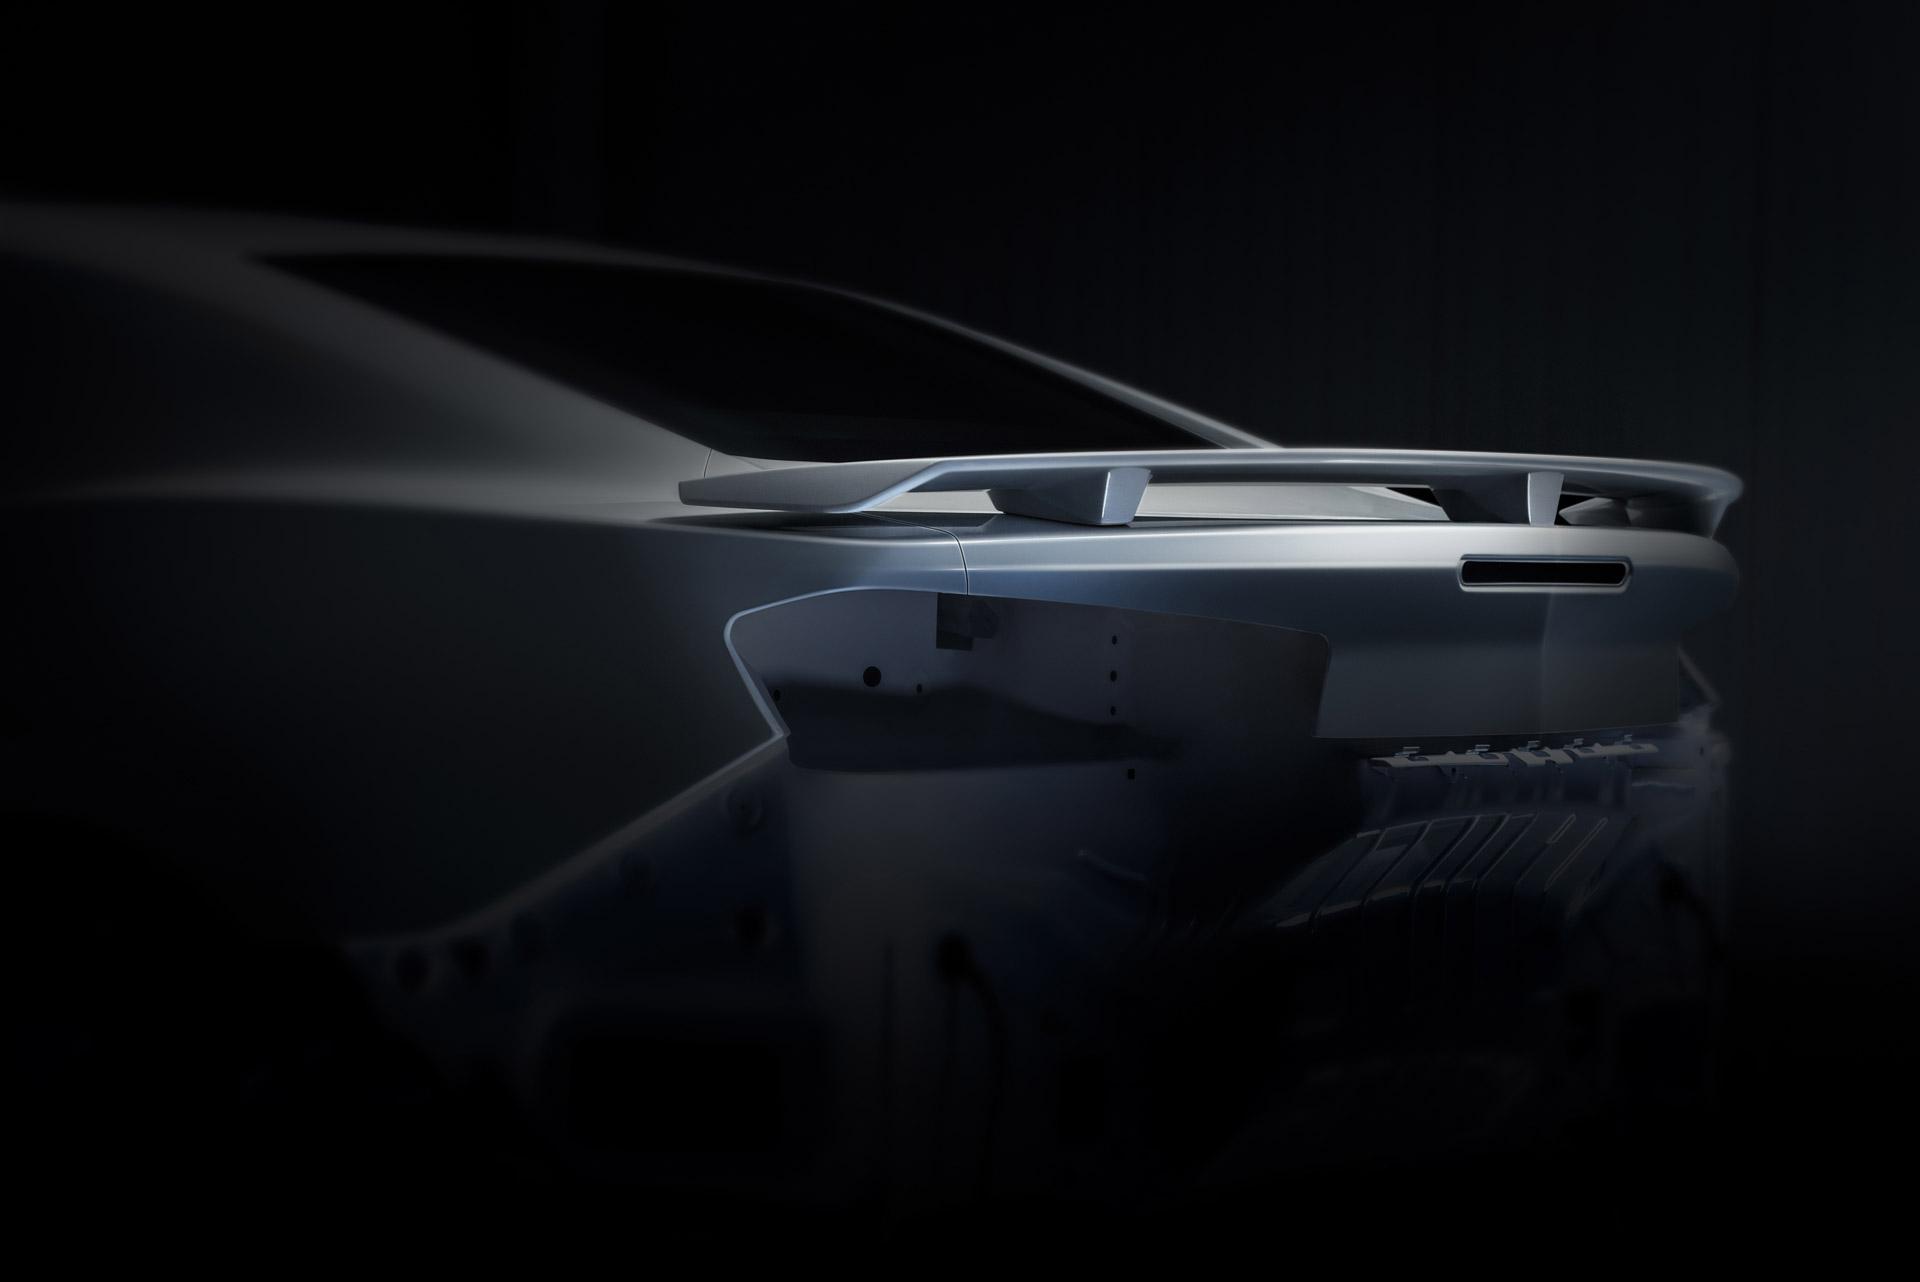 GM Design Chief Ed Welburn Talks About The 2016 Chevy Camaro